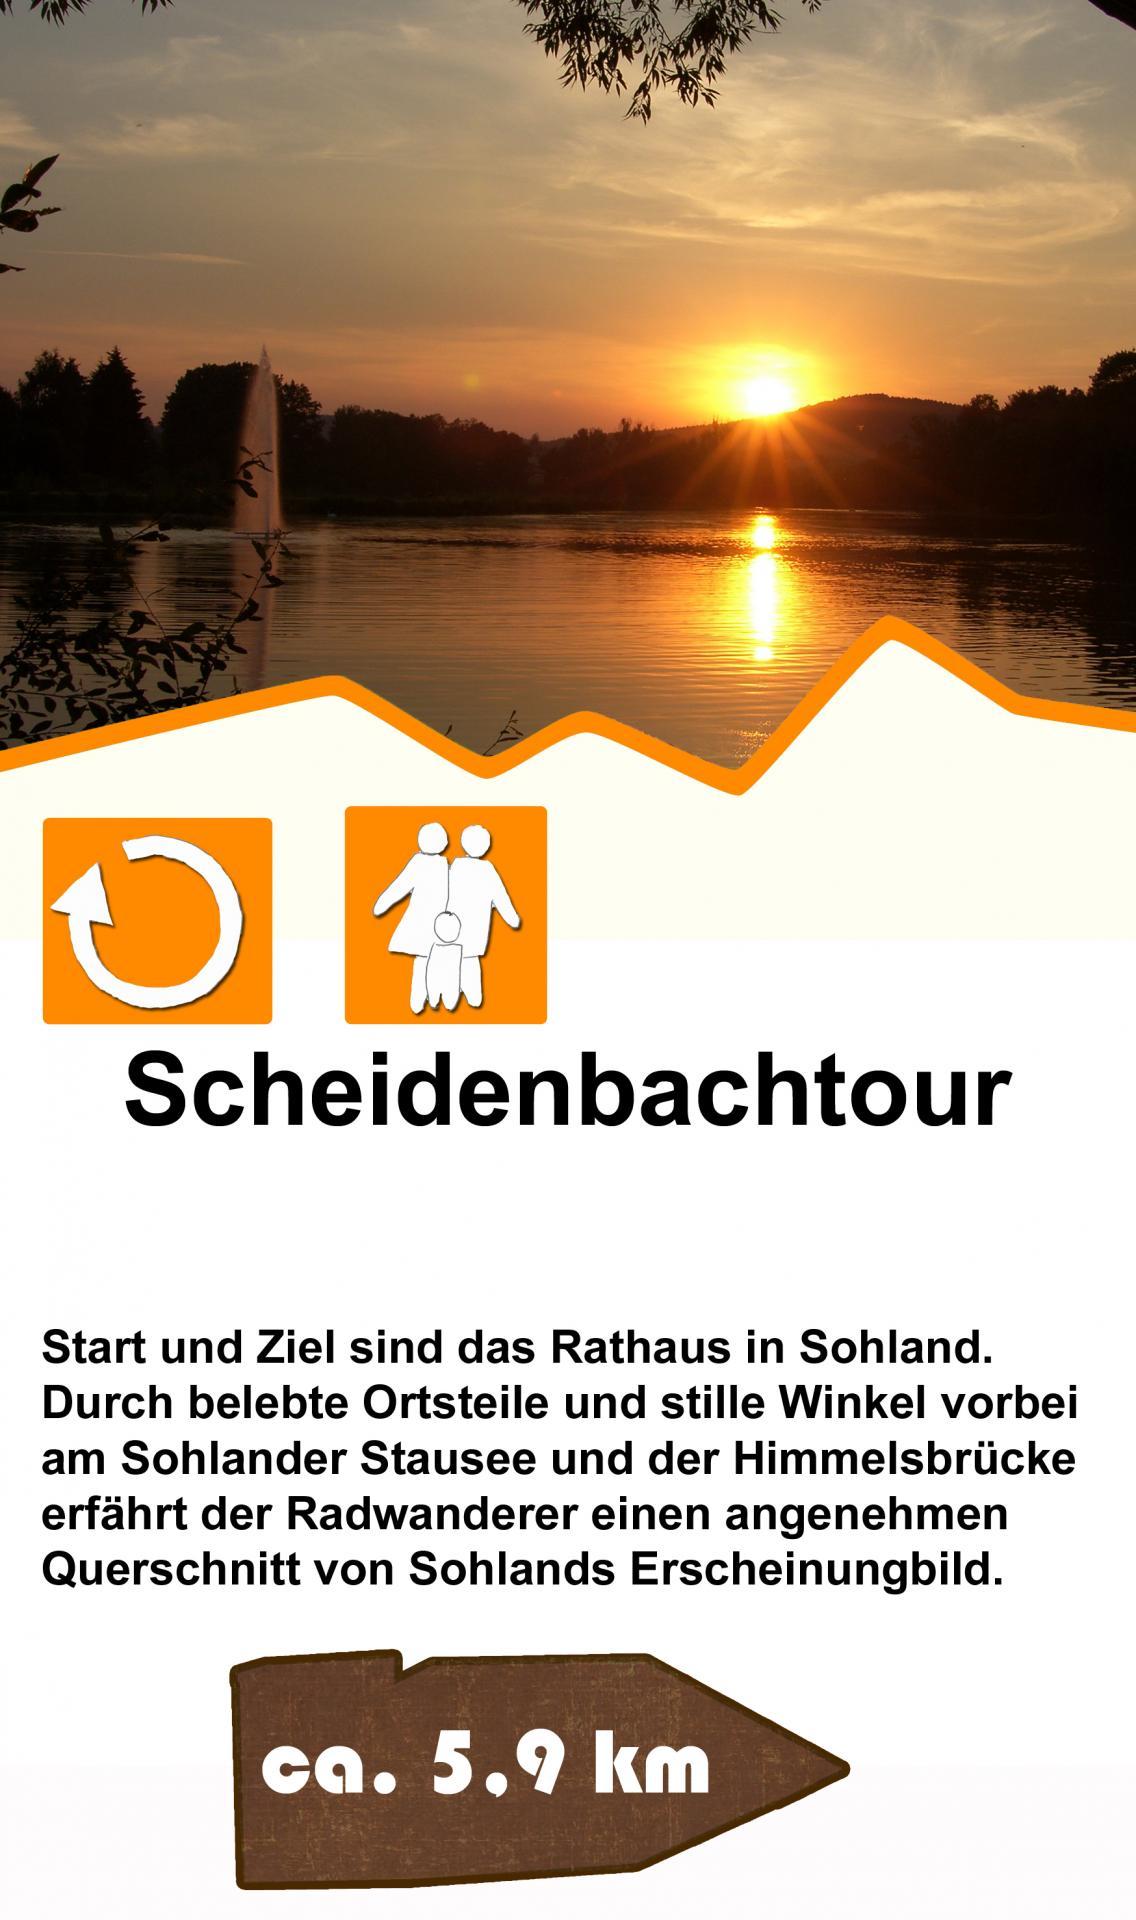 Scheidenbachtour